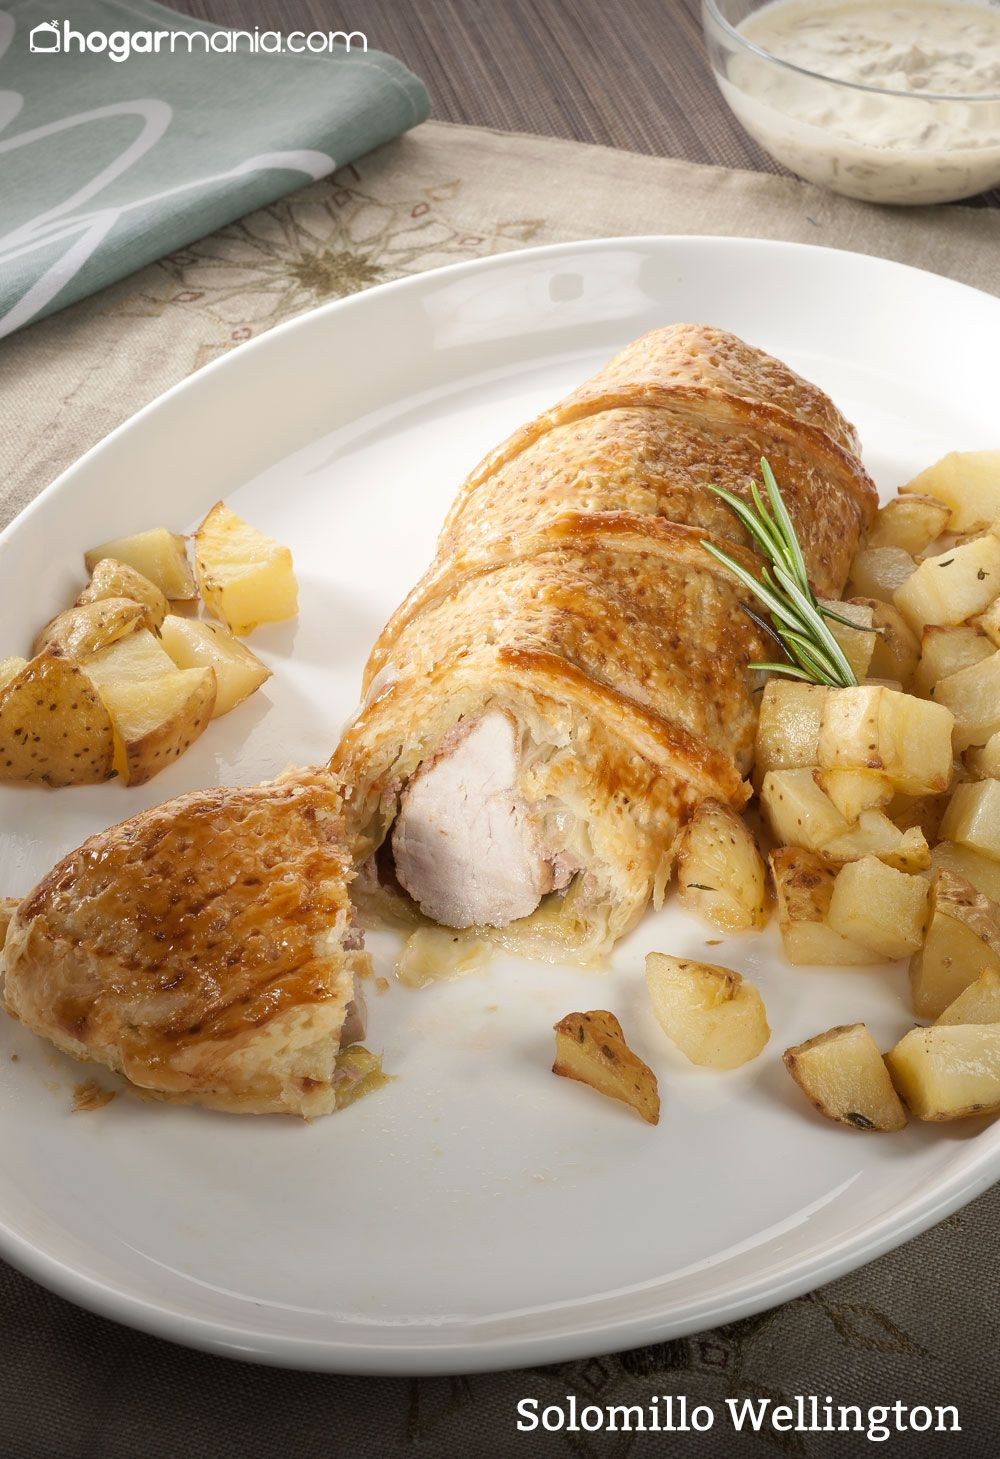 Solomillo Wellington con patatas asadas